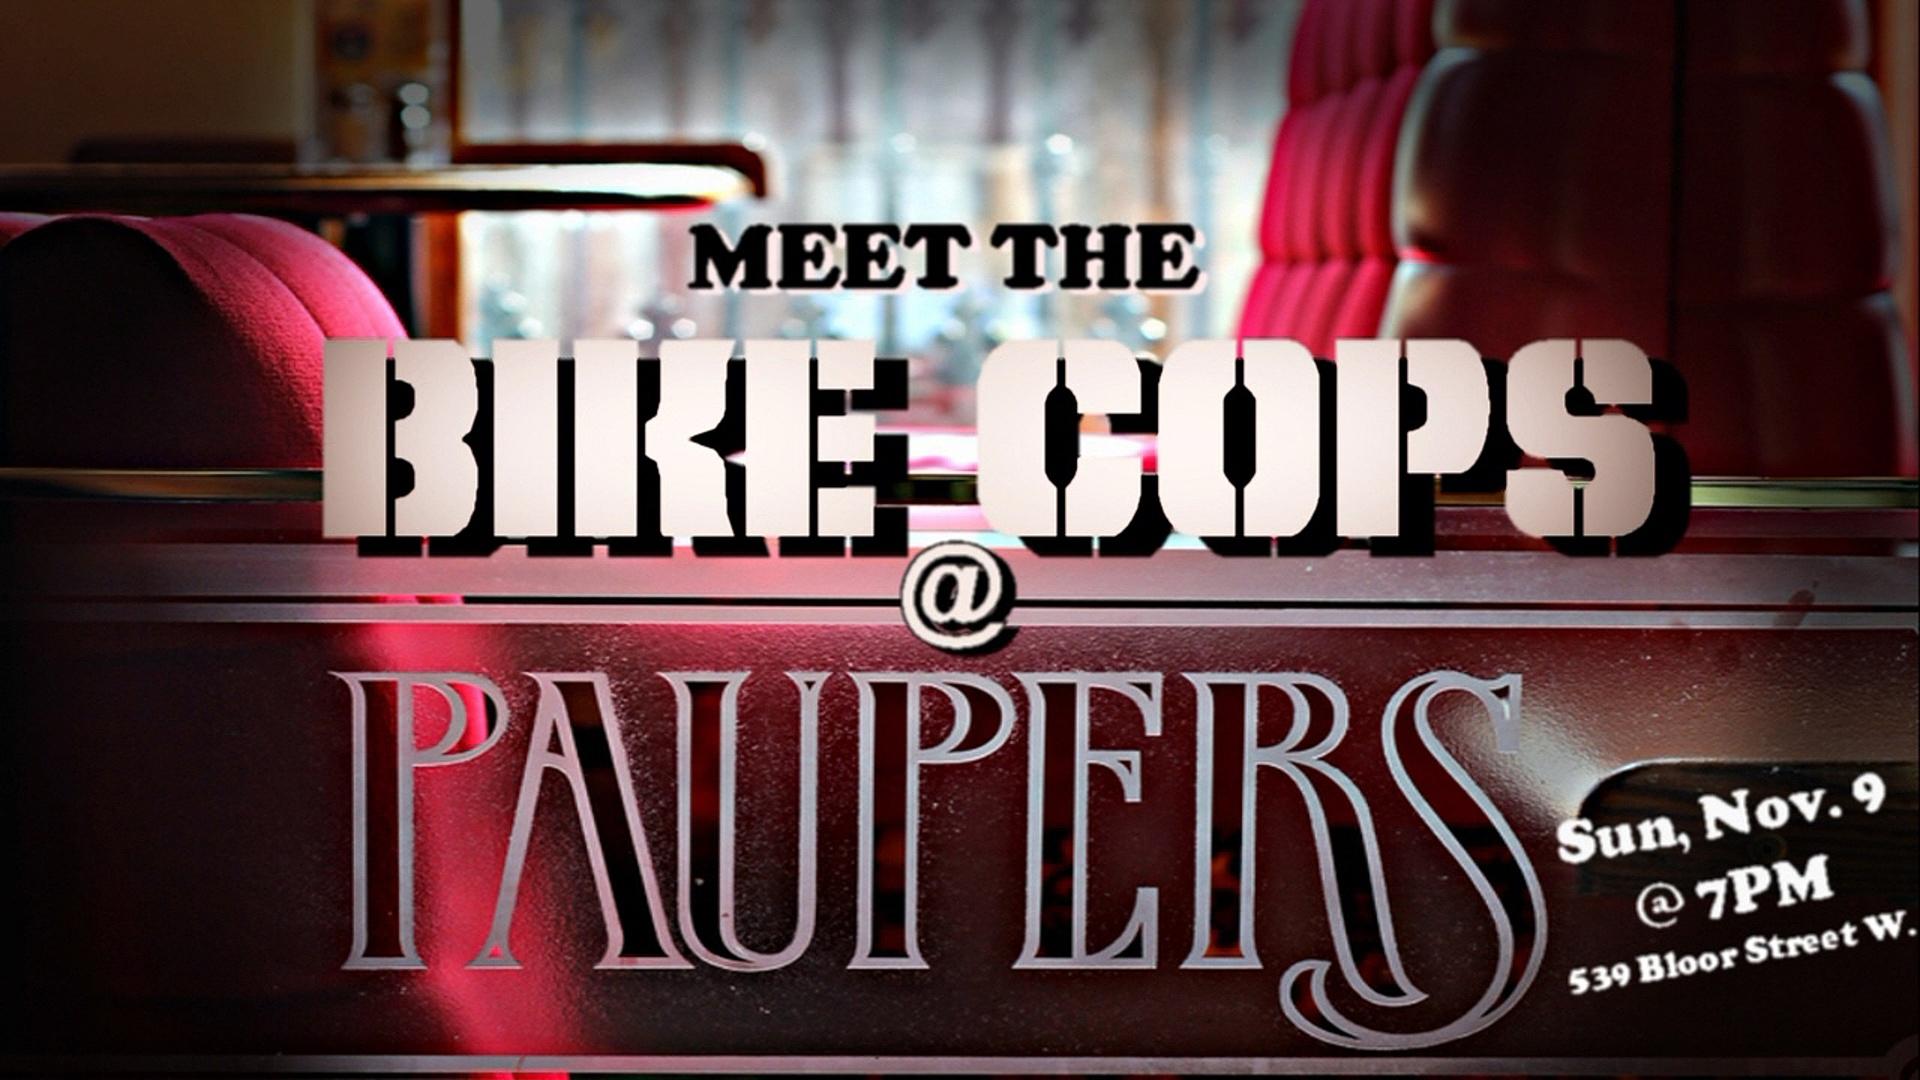 Meet the Bike Cops